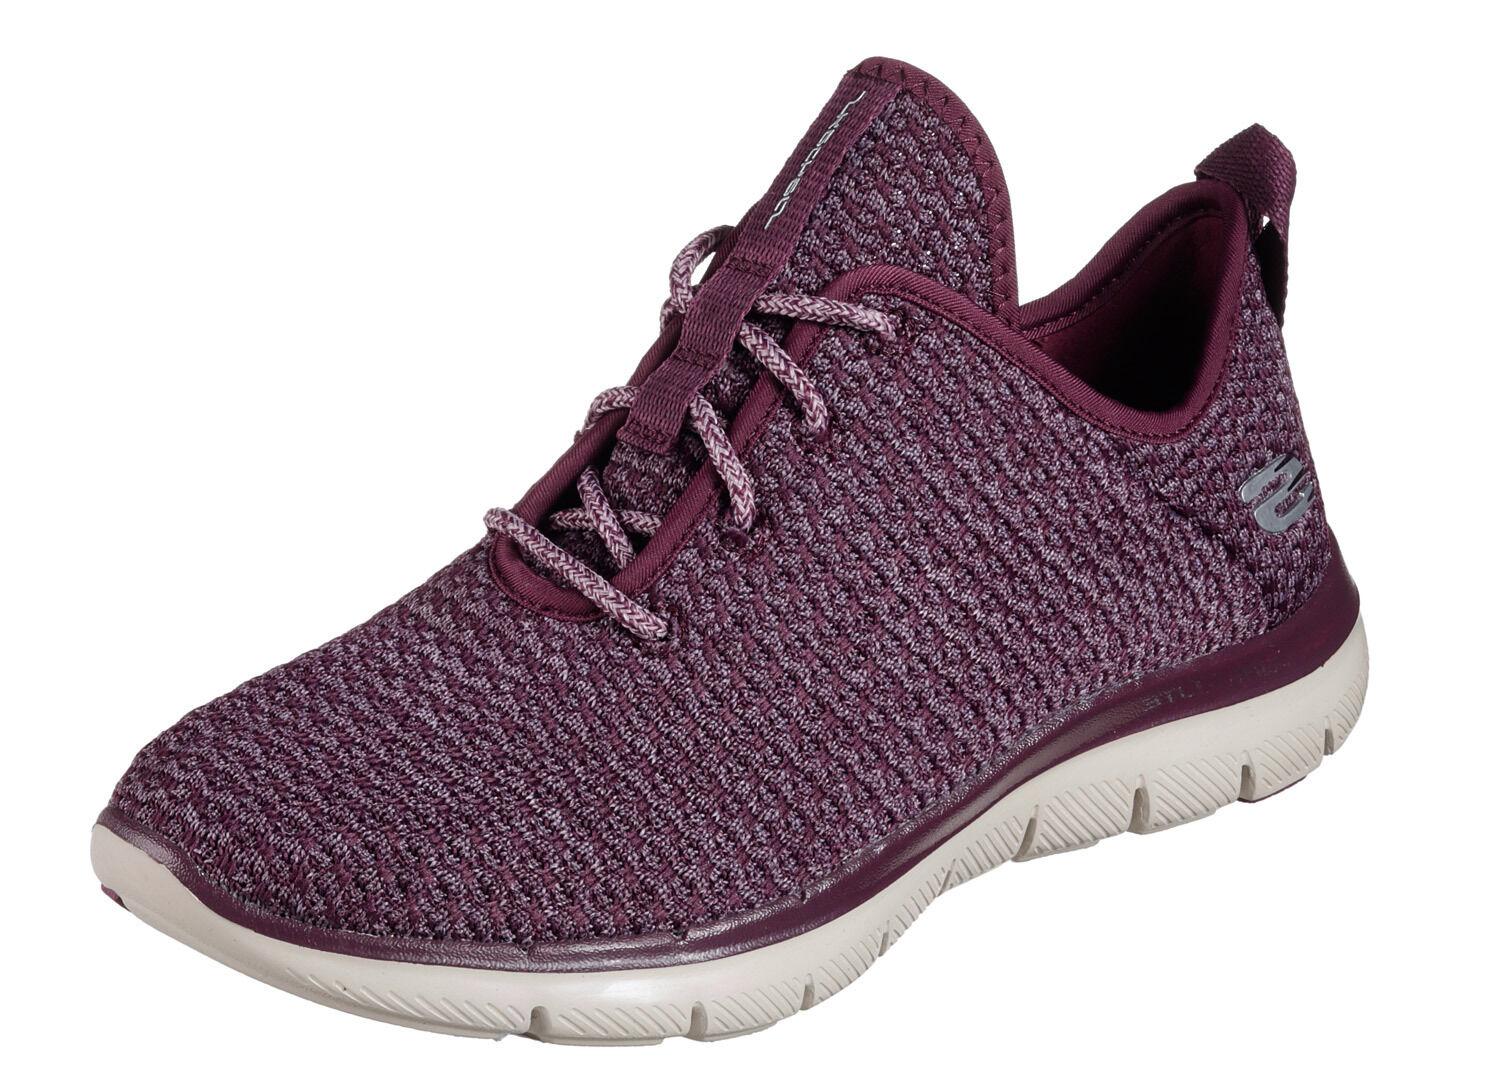 Skechers NEW Flex Bppeal Bold Move plum purple comfort trainers sizes 3-8    £62